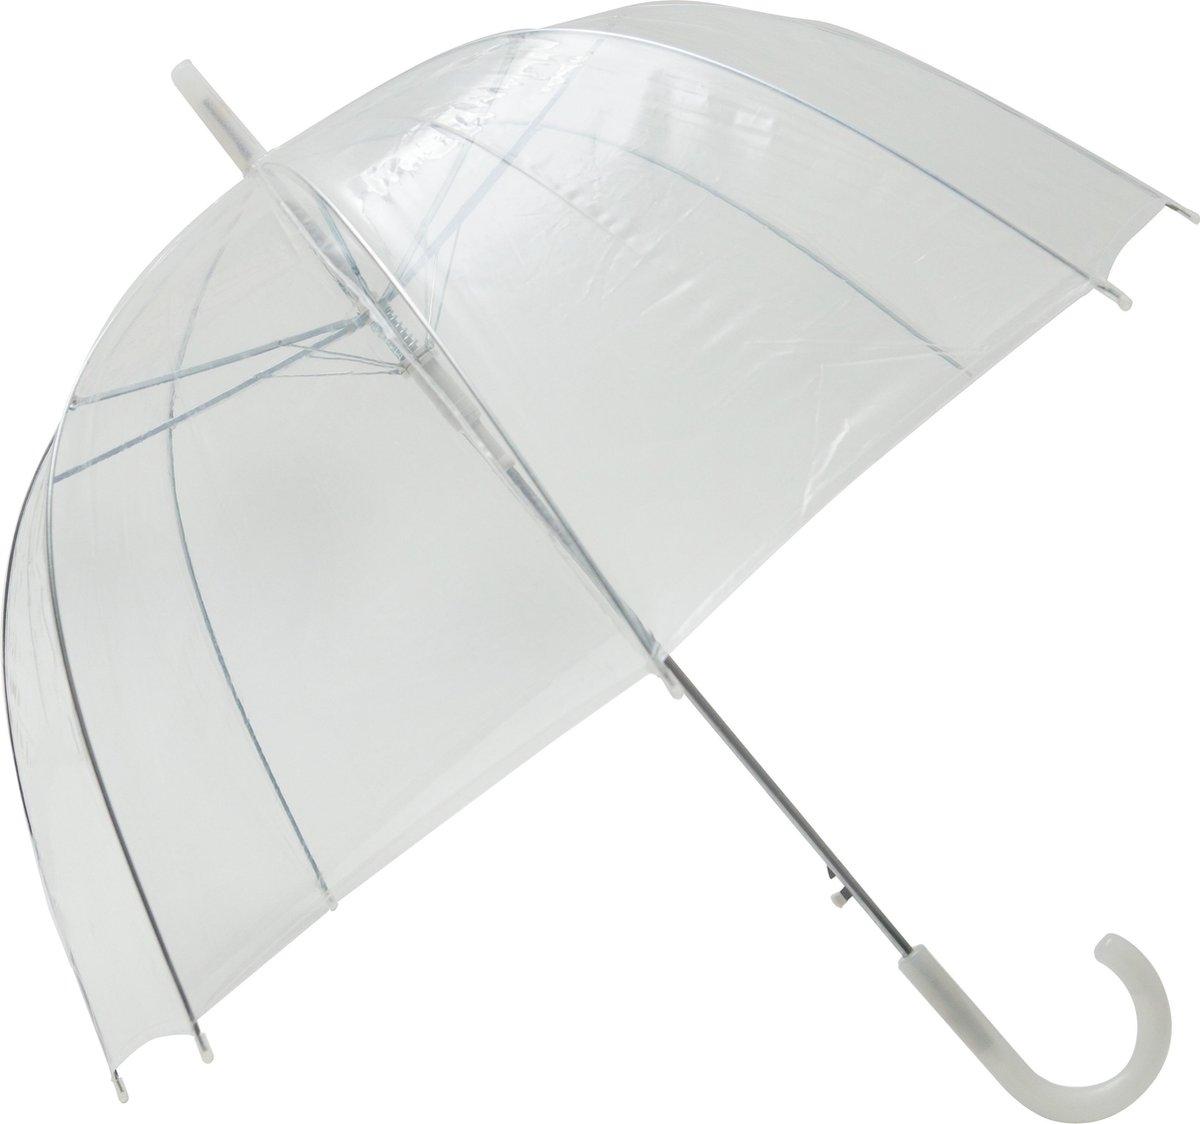 Smati Transparant Basic Paraplu   85cm - Wit